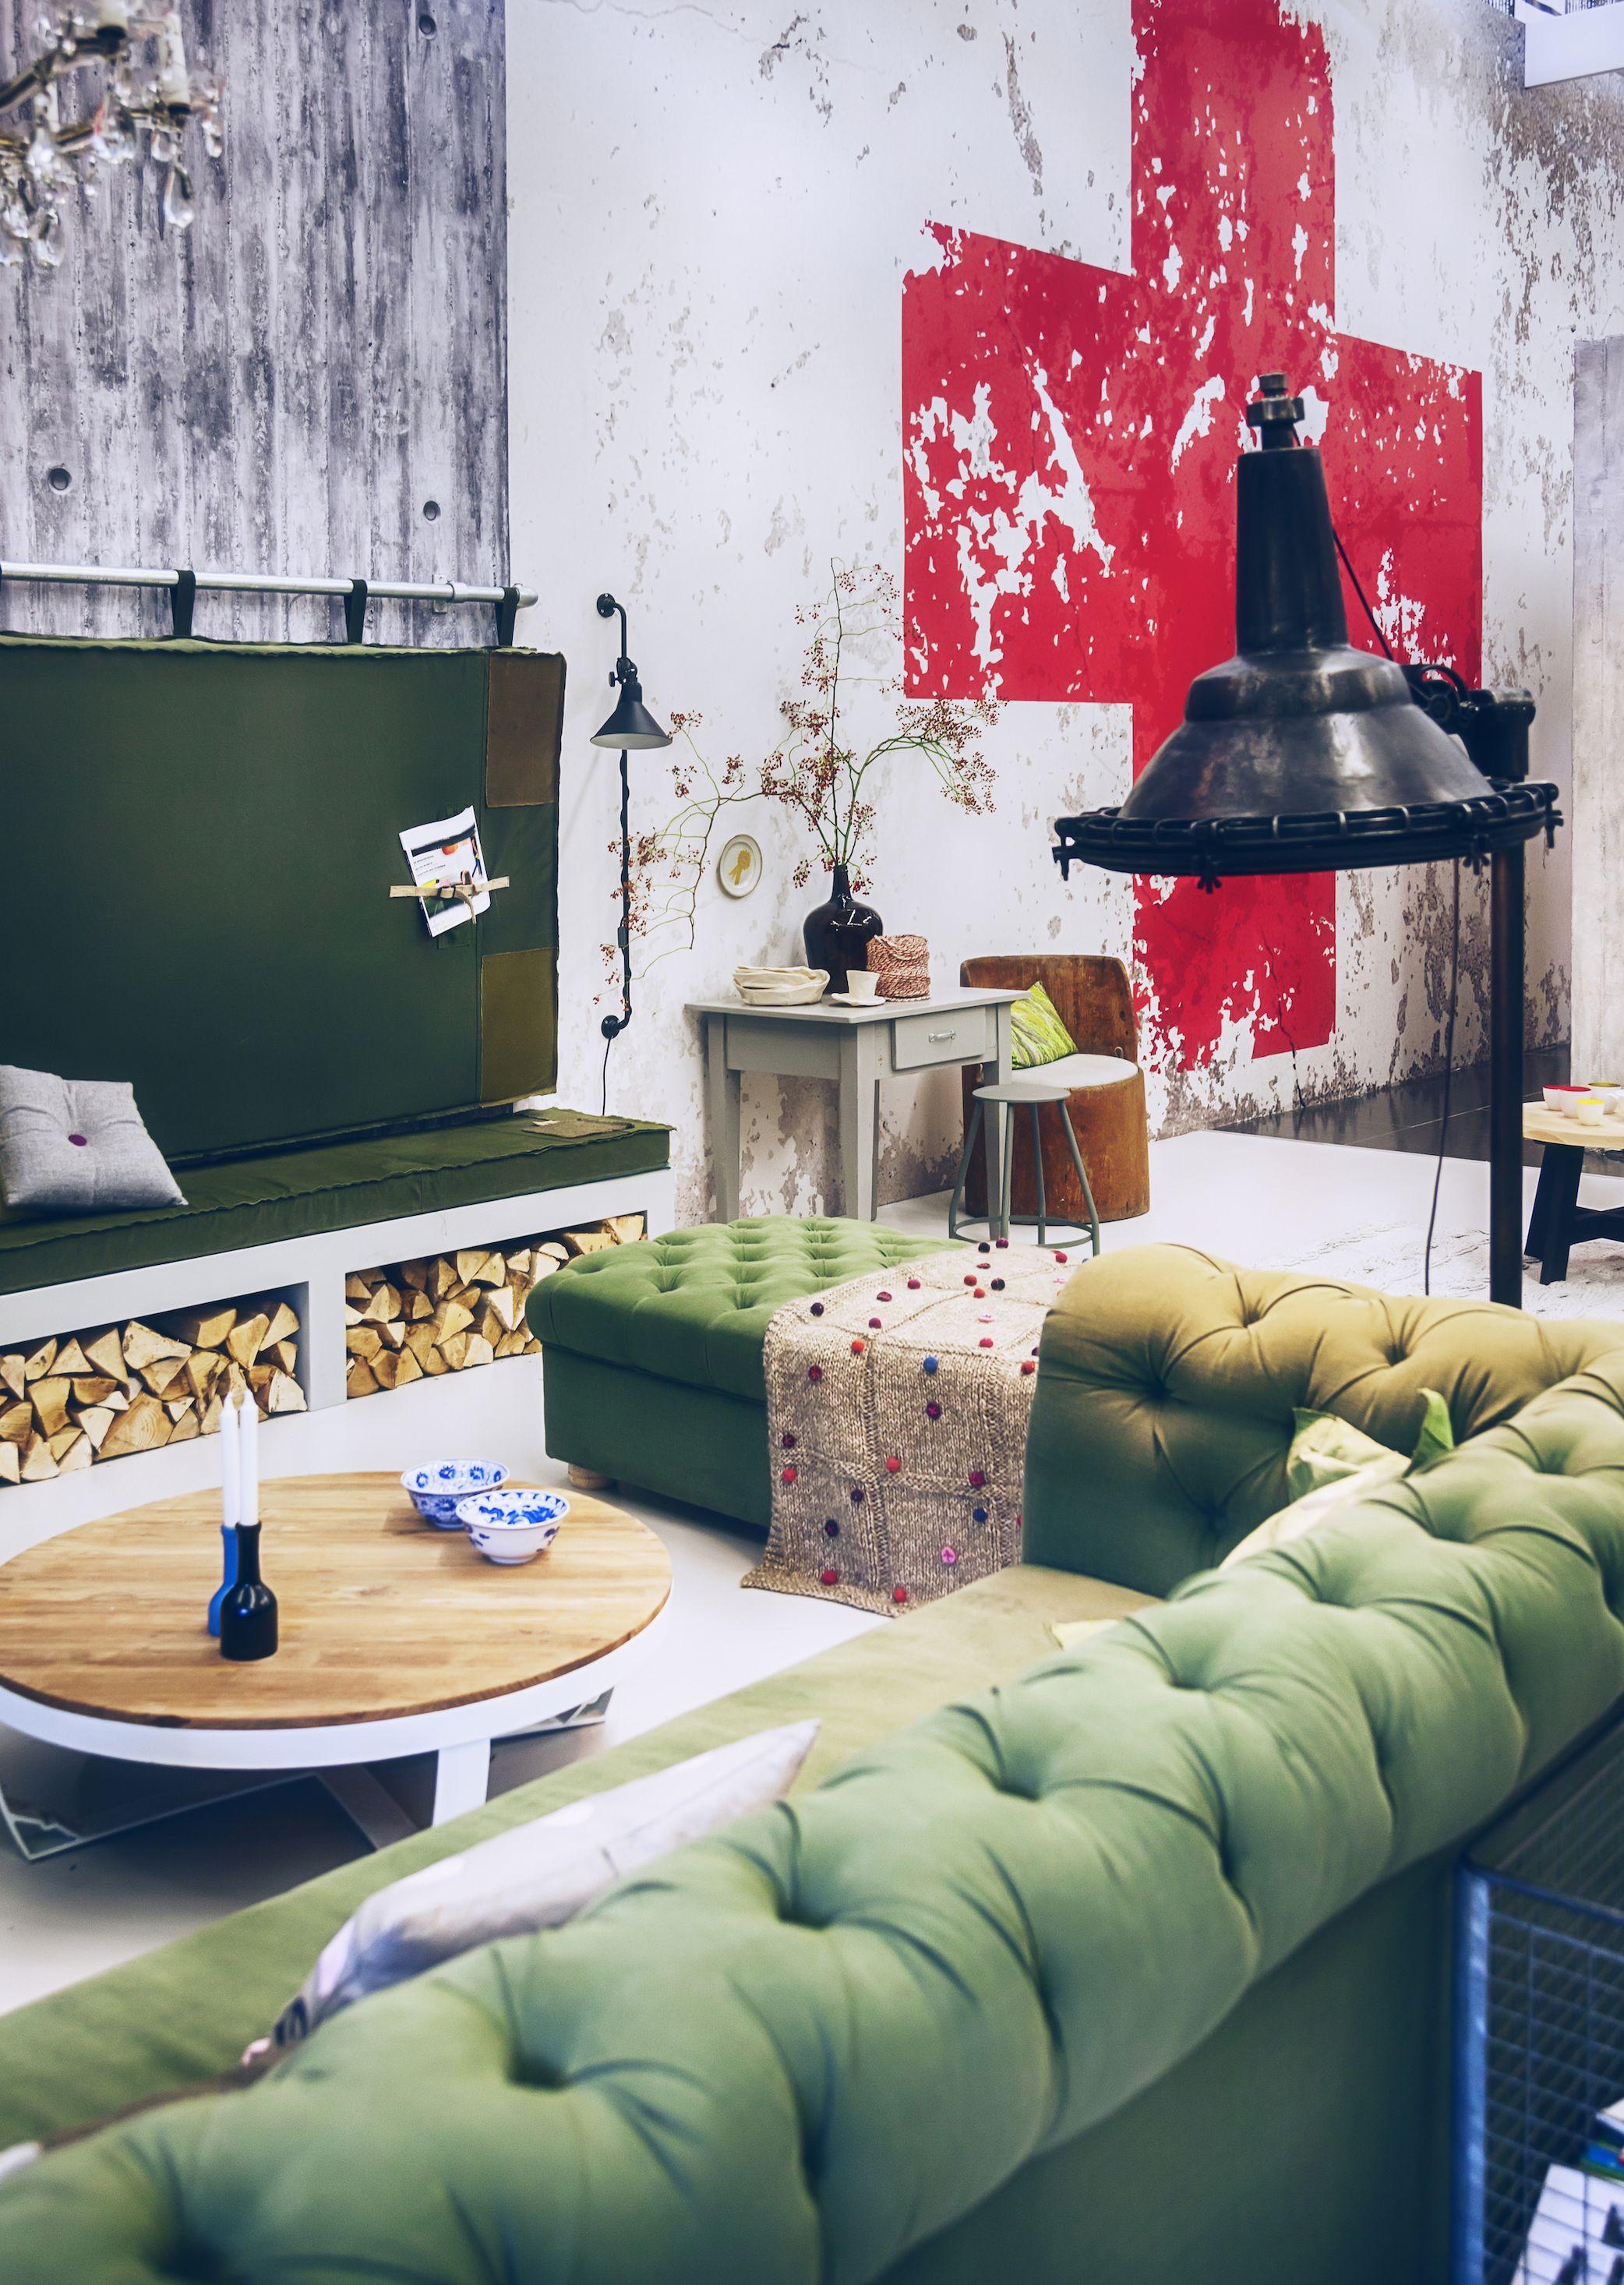 www amazon com prestigepaints living room inspiration on living room color inspiration id=98343